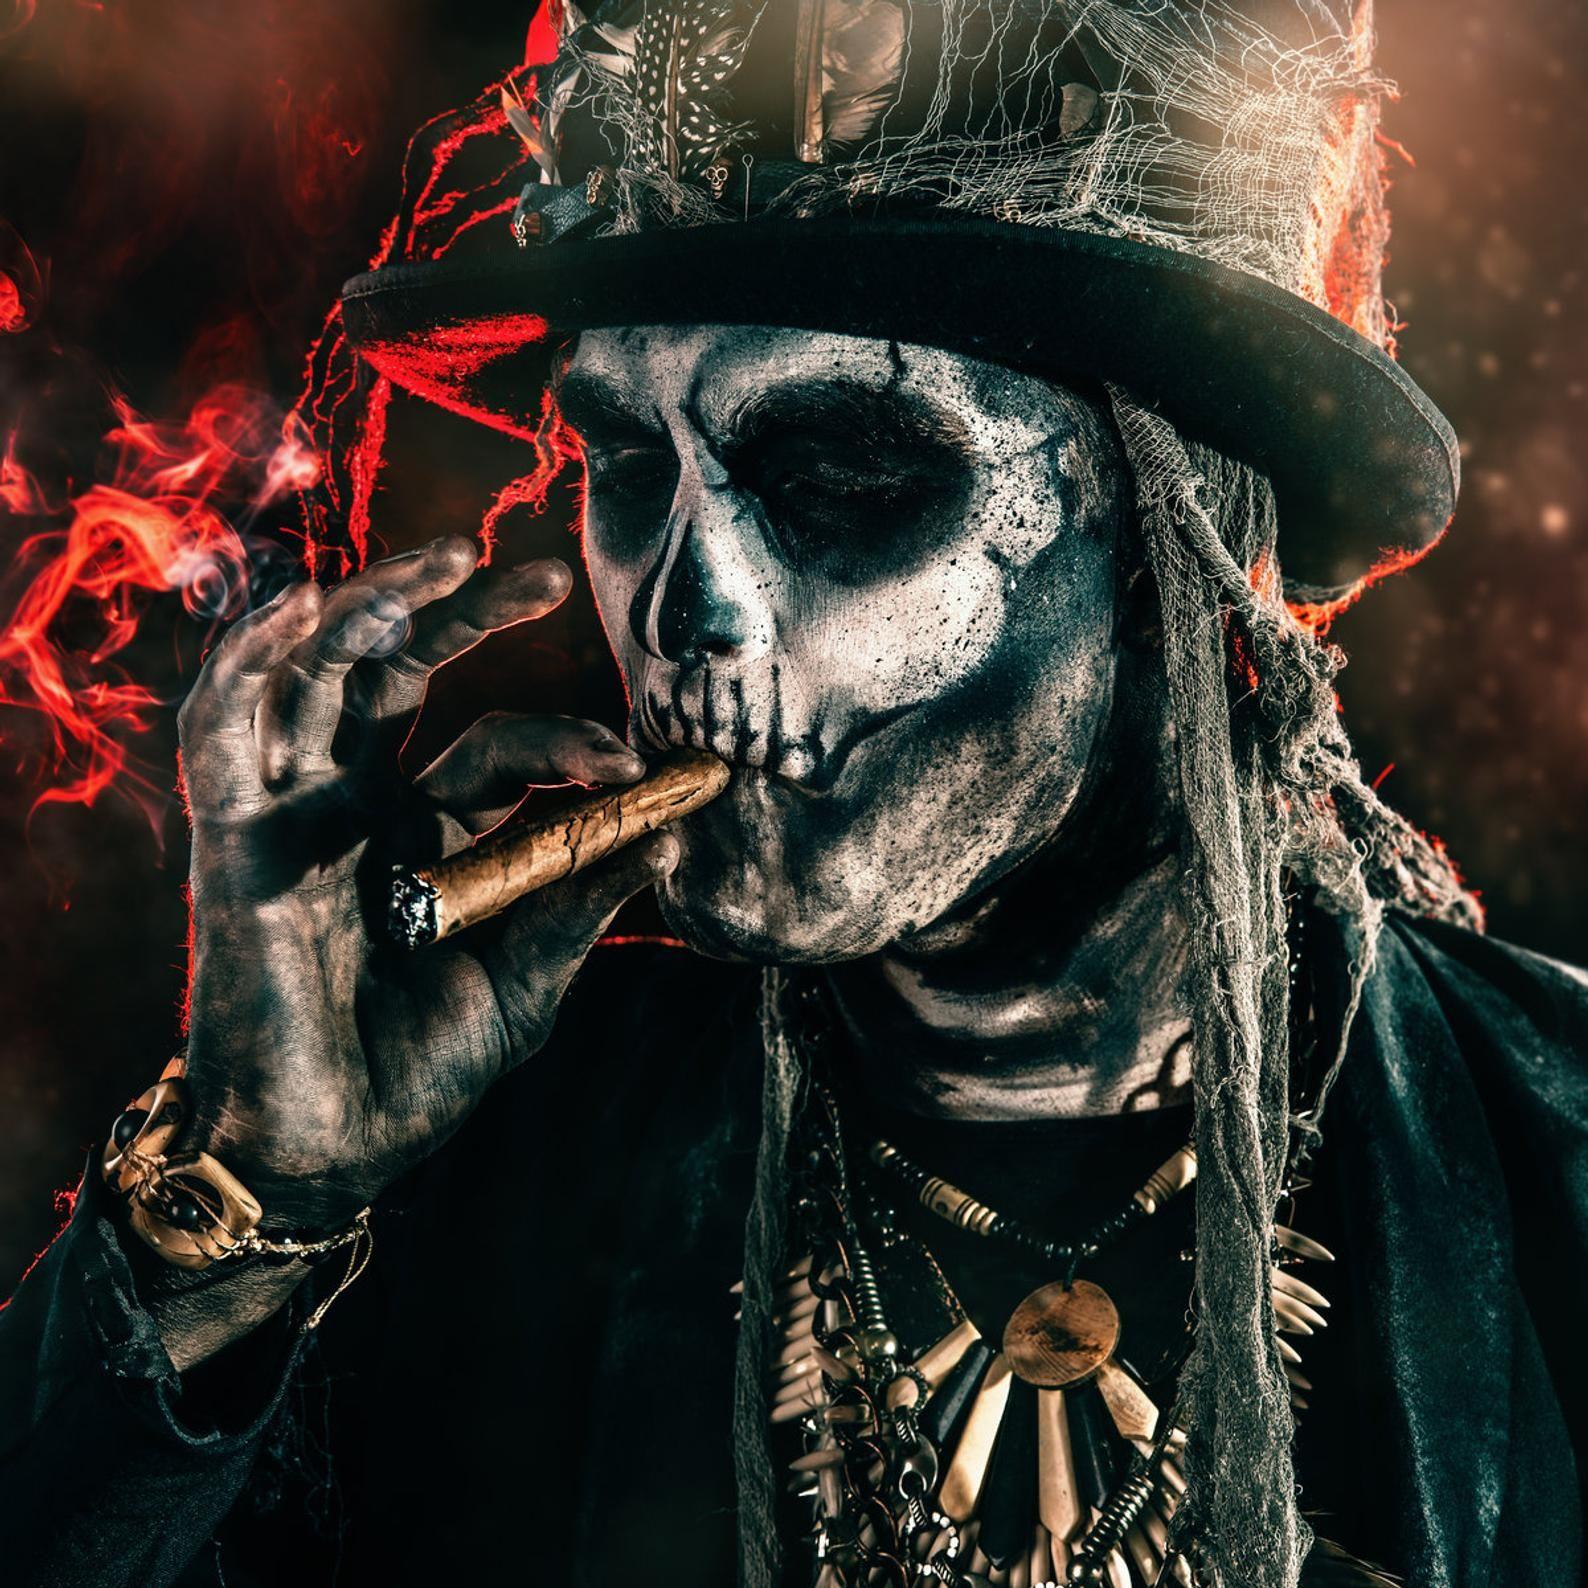 BARON SAMEDI Voodoo Spirit Unframed Print Free Shipping | Etsy | Baron  samedi, Voodoo costume, Voodoo